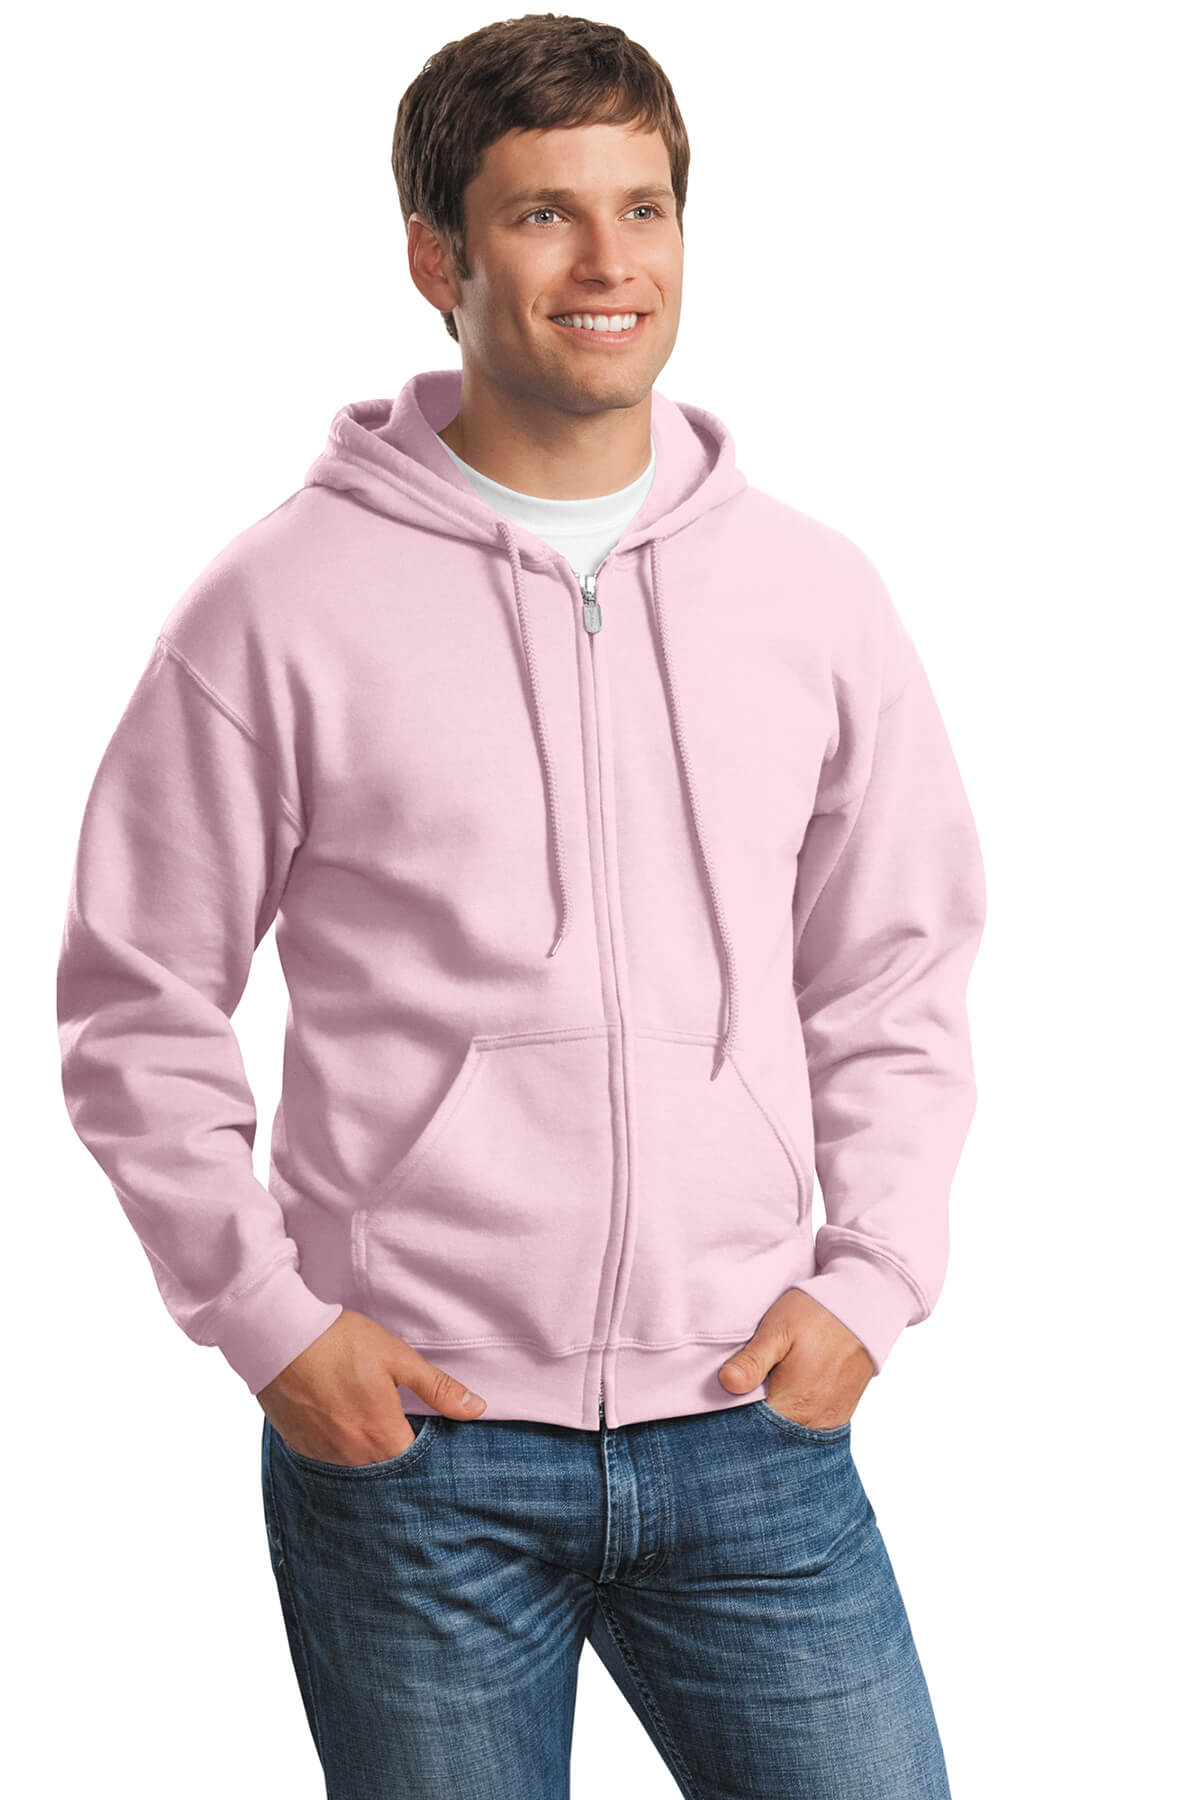 18600-light-pink-4